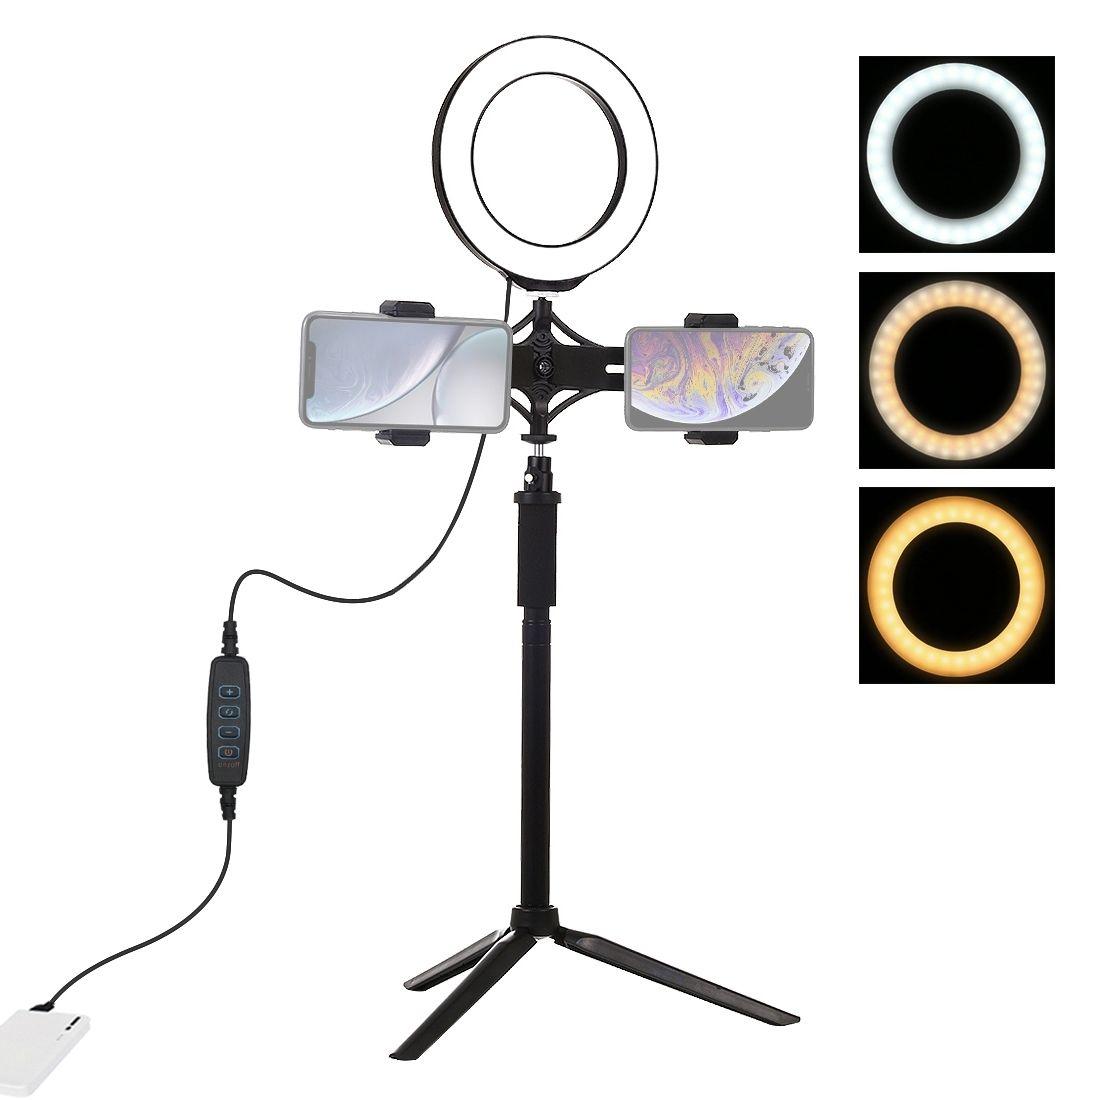 PULUZ جبل ترايبود + تمديد رود + بث مباشر المزدوج الهاتف القوس + 6.2 بوصة 16CM LED الدائري مشاركة في مدونة فيديو فيديو ضوء أطقم